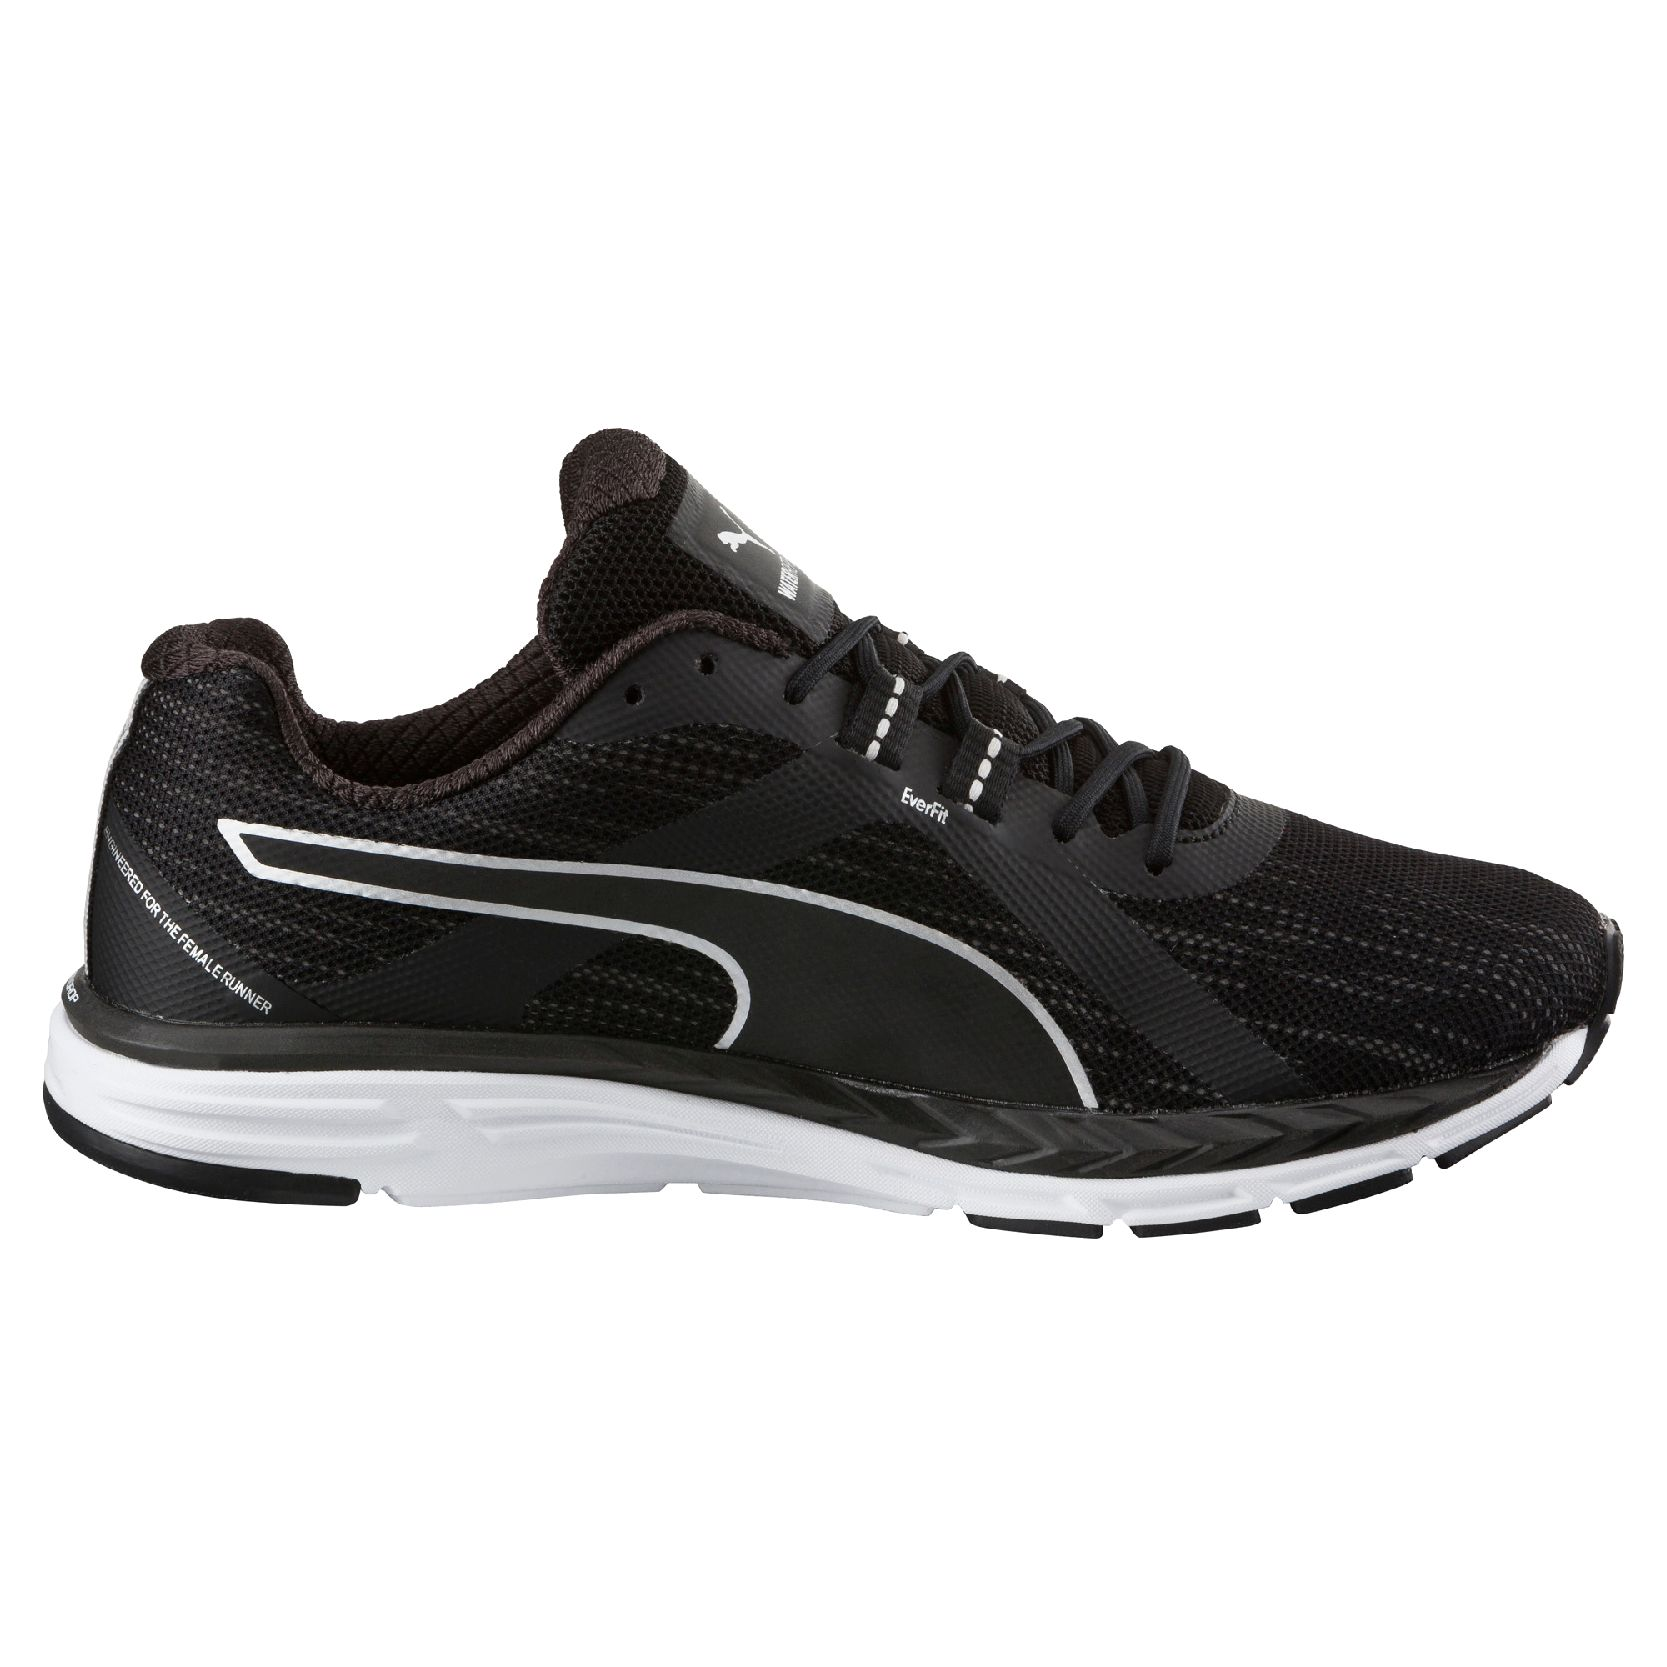 Puma Speed 500 Ignite Nightcat Ladies Running Shoes